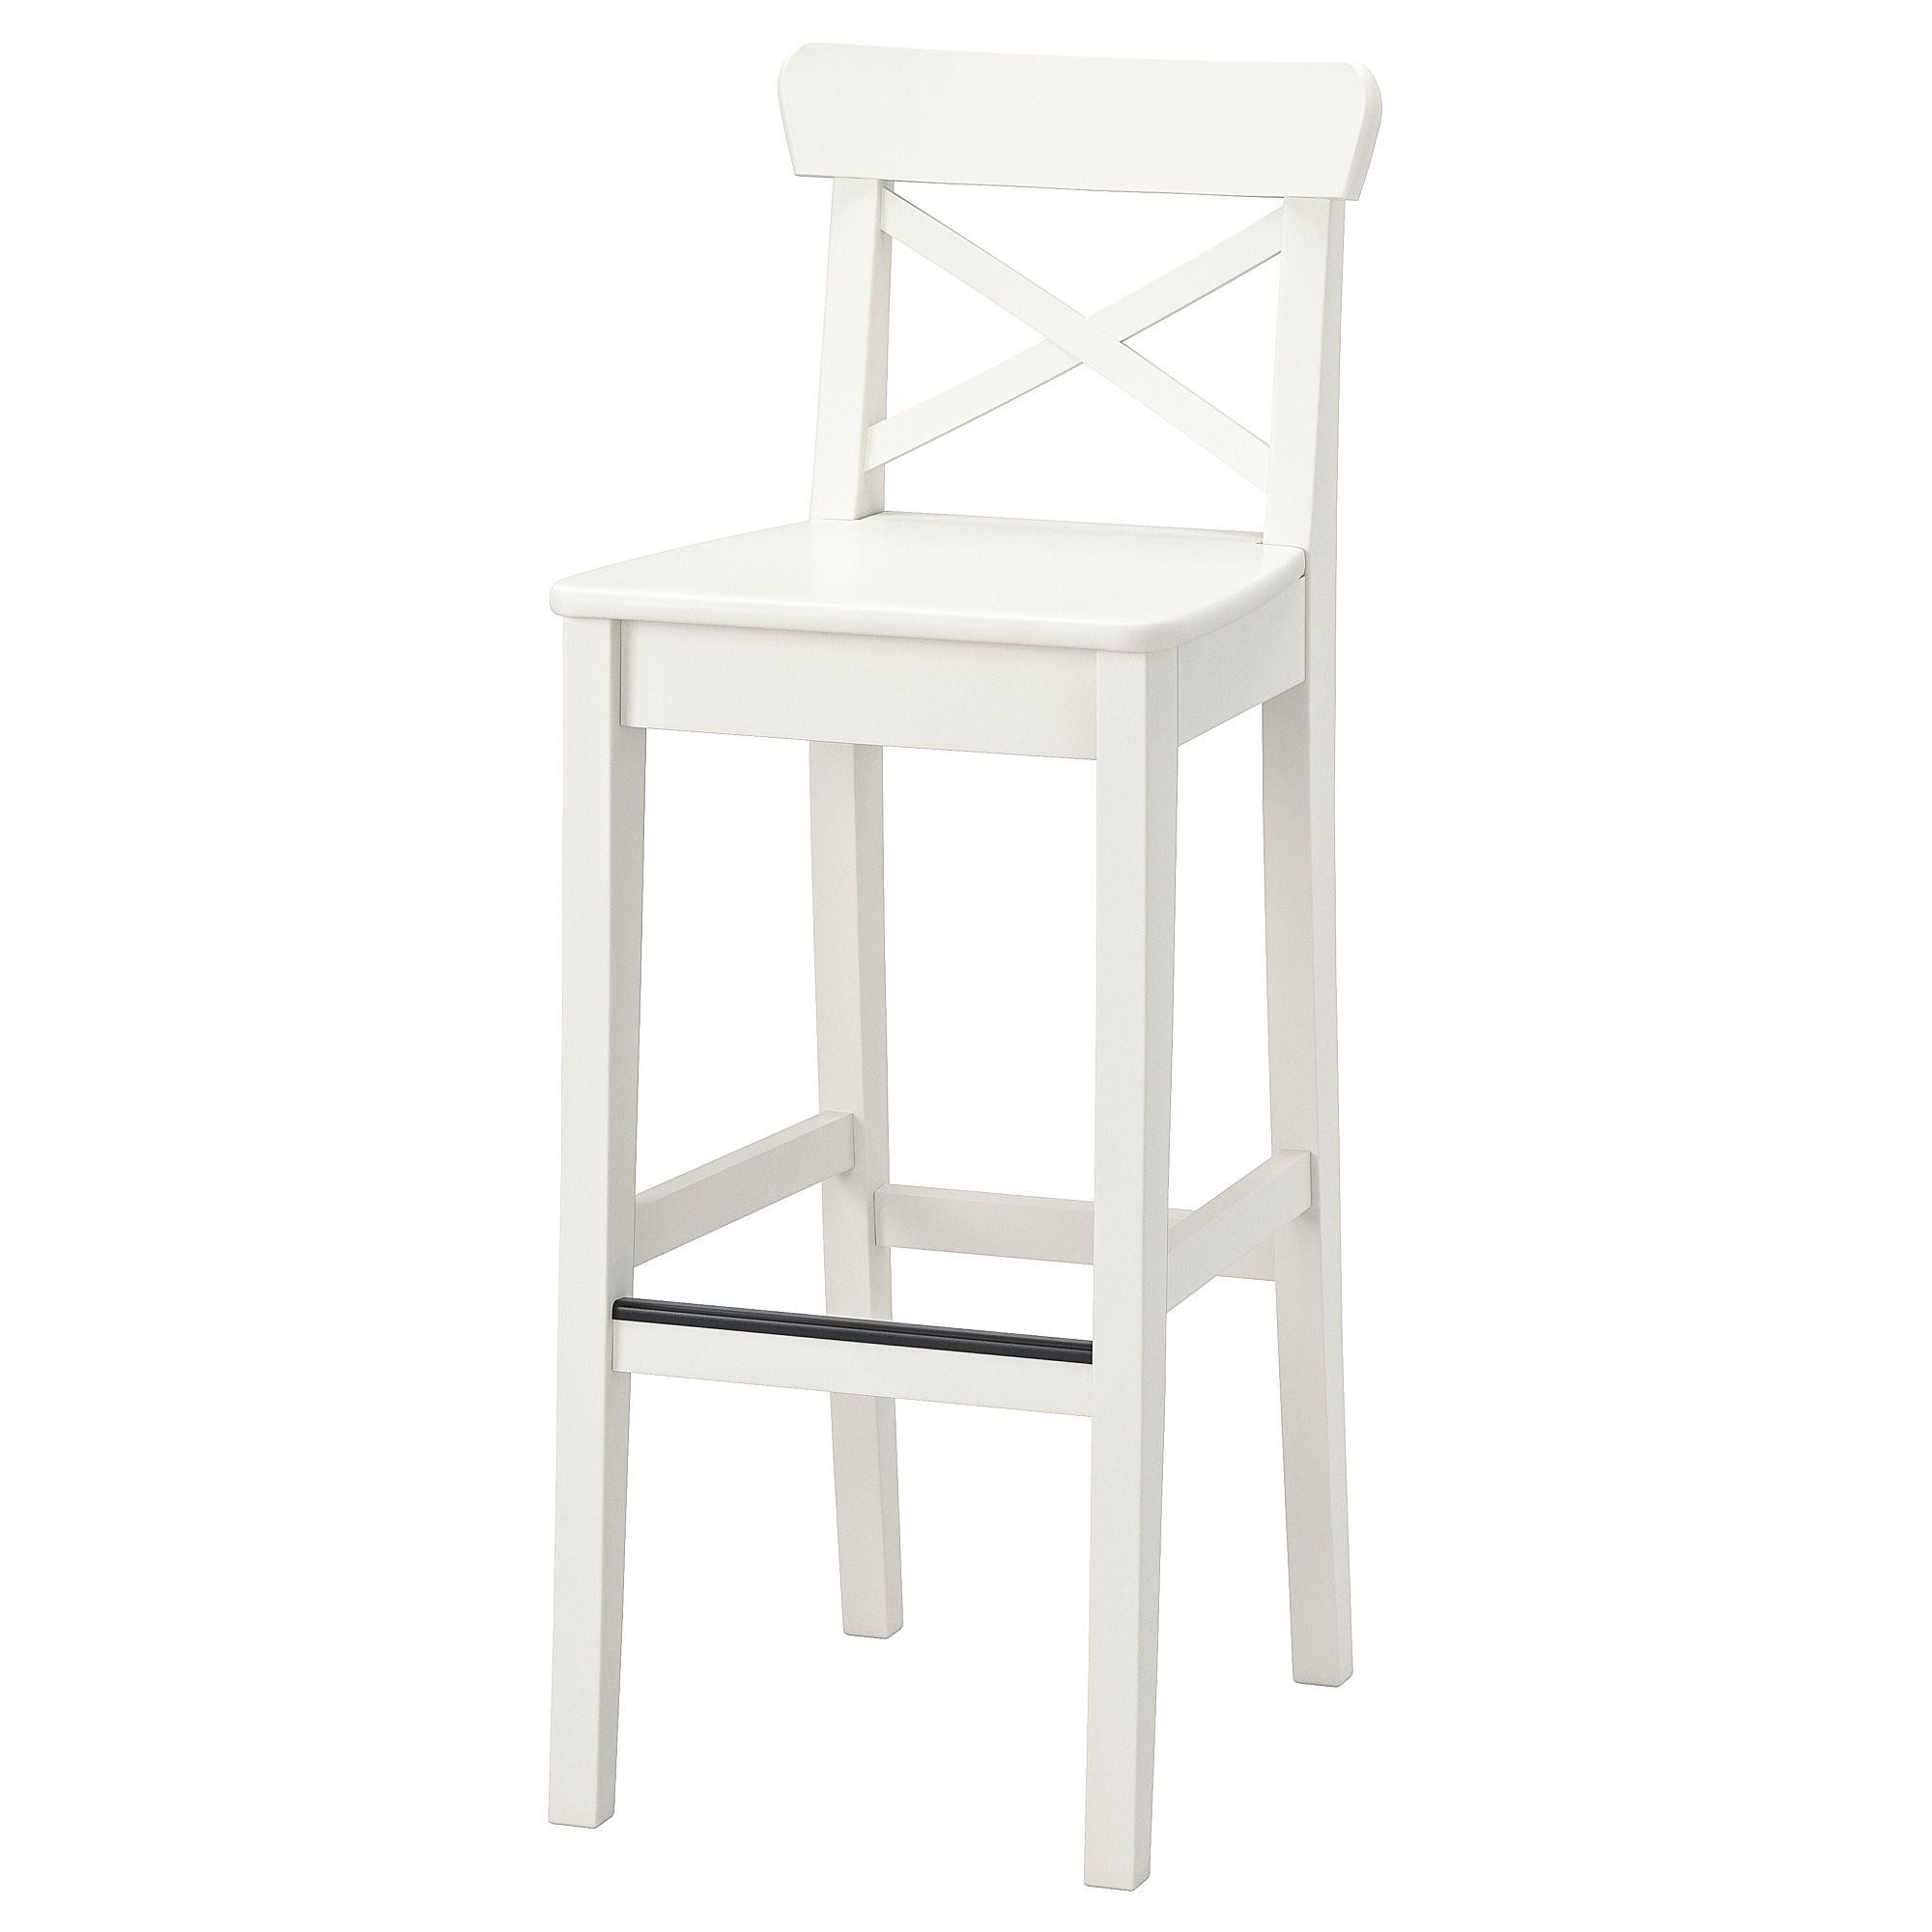 Ikea Ingolf White Bar Stool With Backrest Bar Furniture Bar Stools Ikea Bar